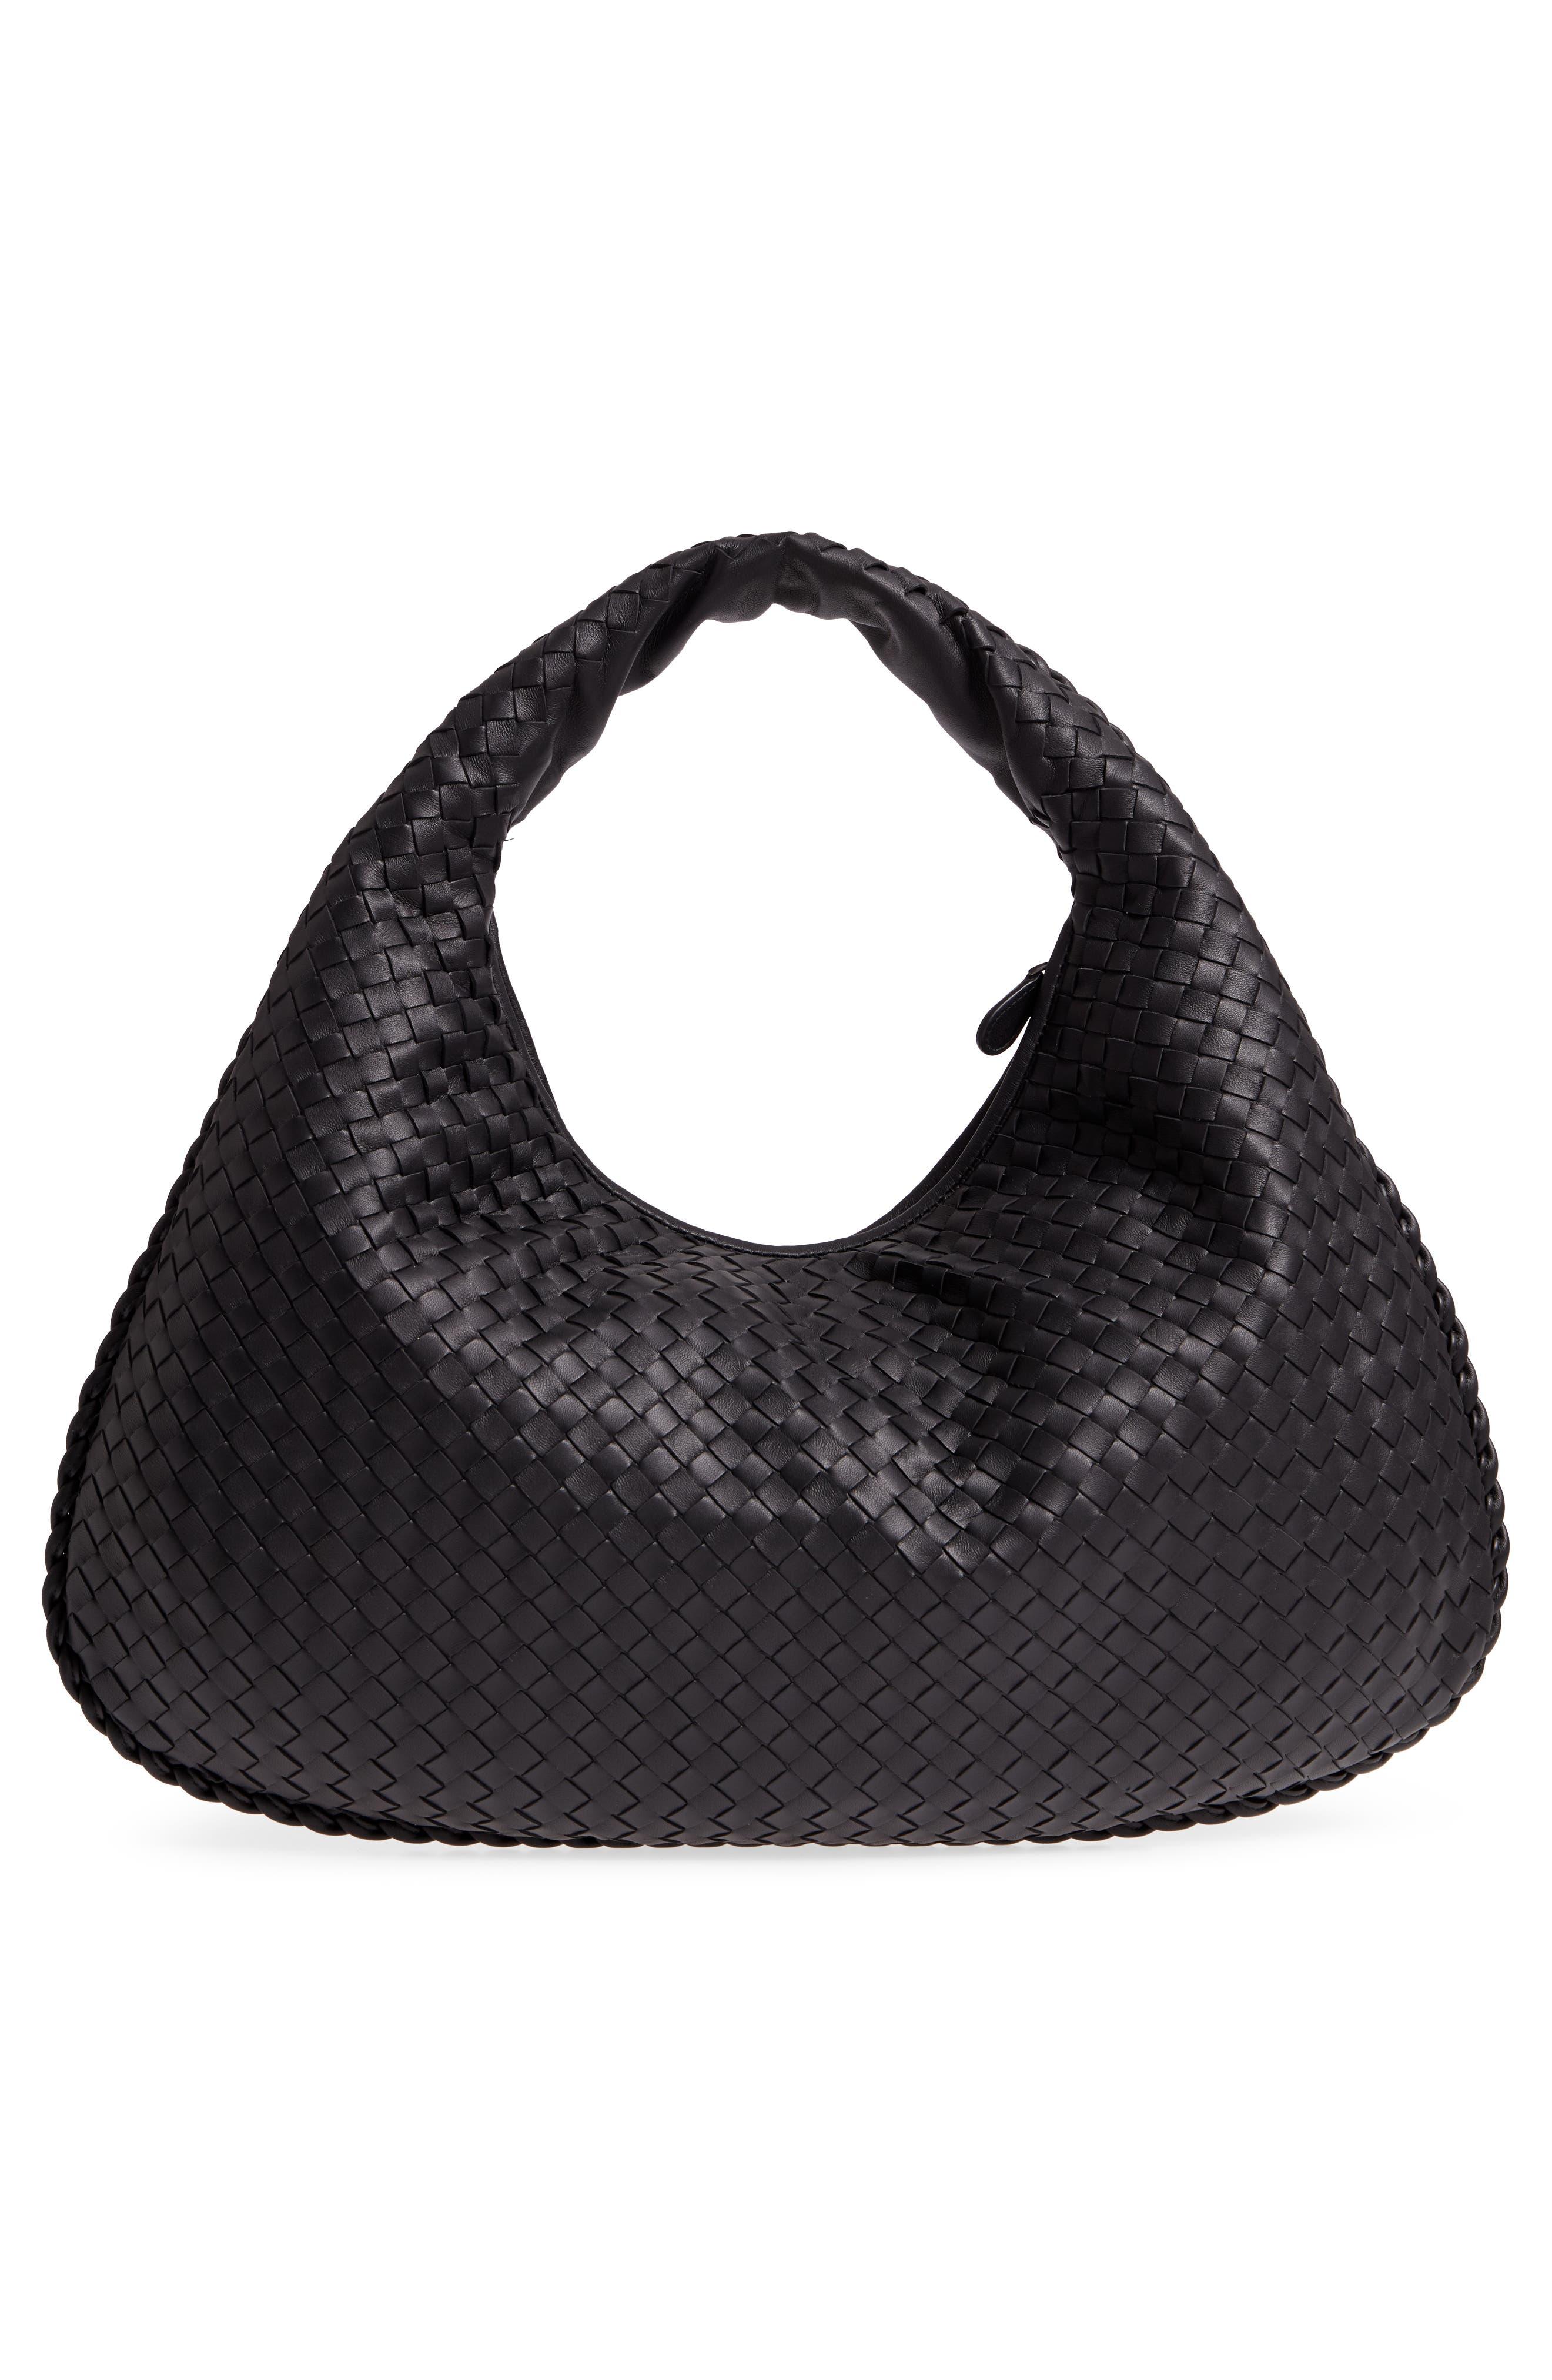 Large Veneta Leather Hobo,                             Alternate thumbnail 3, color,                             8175 NERO